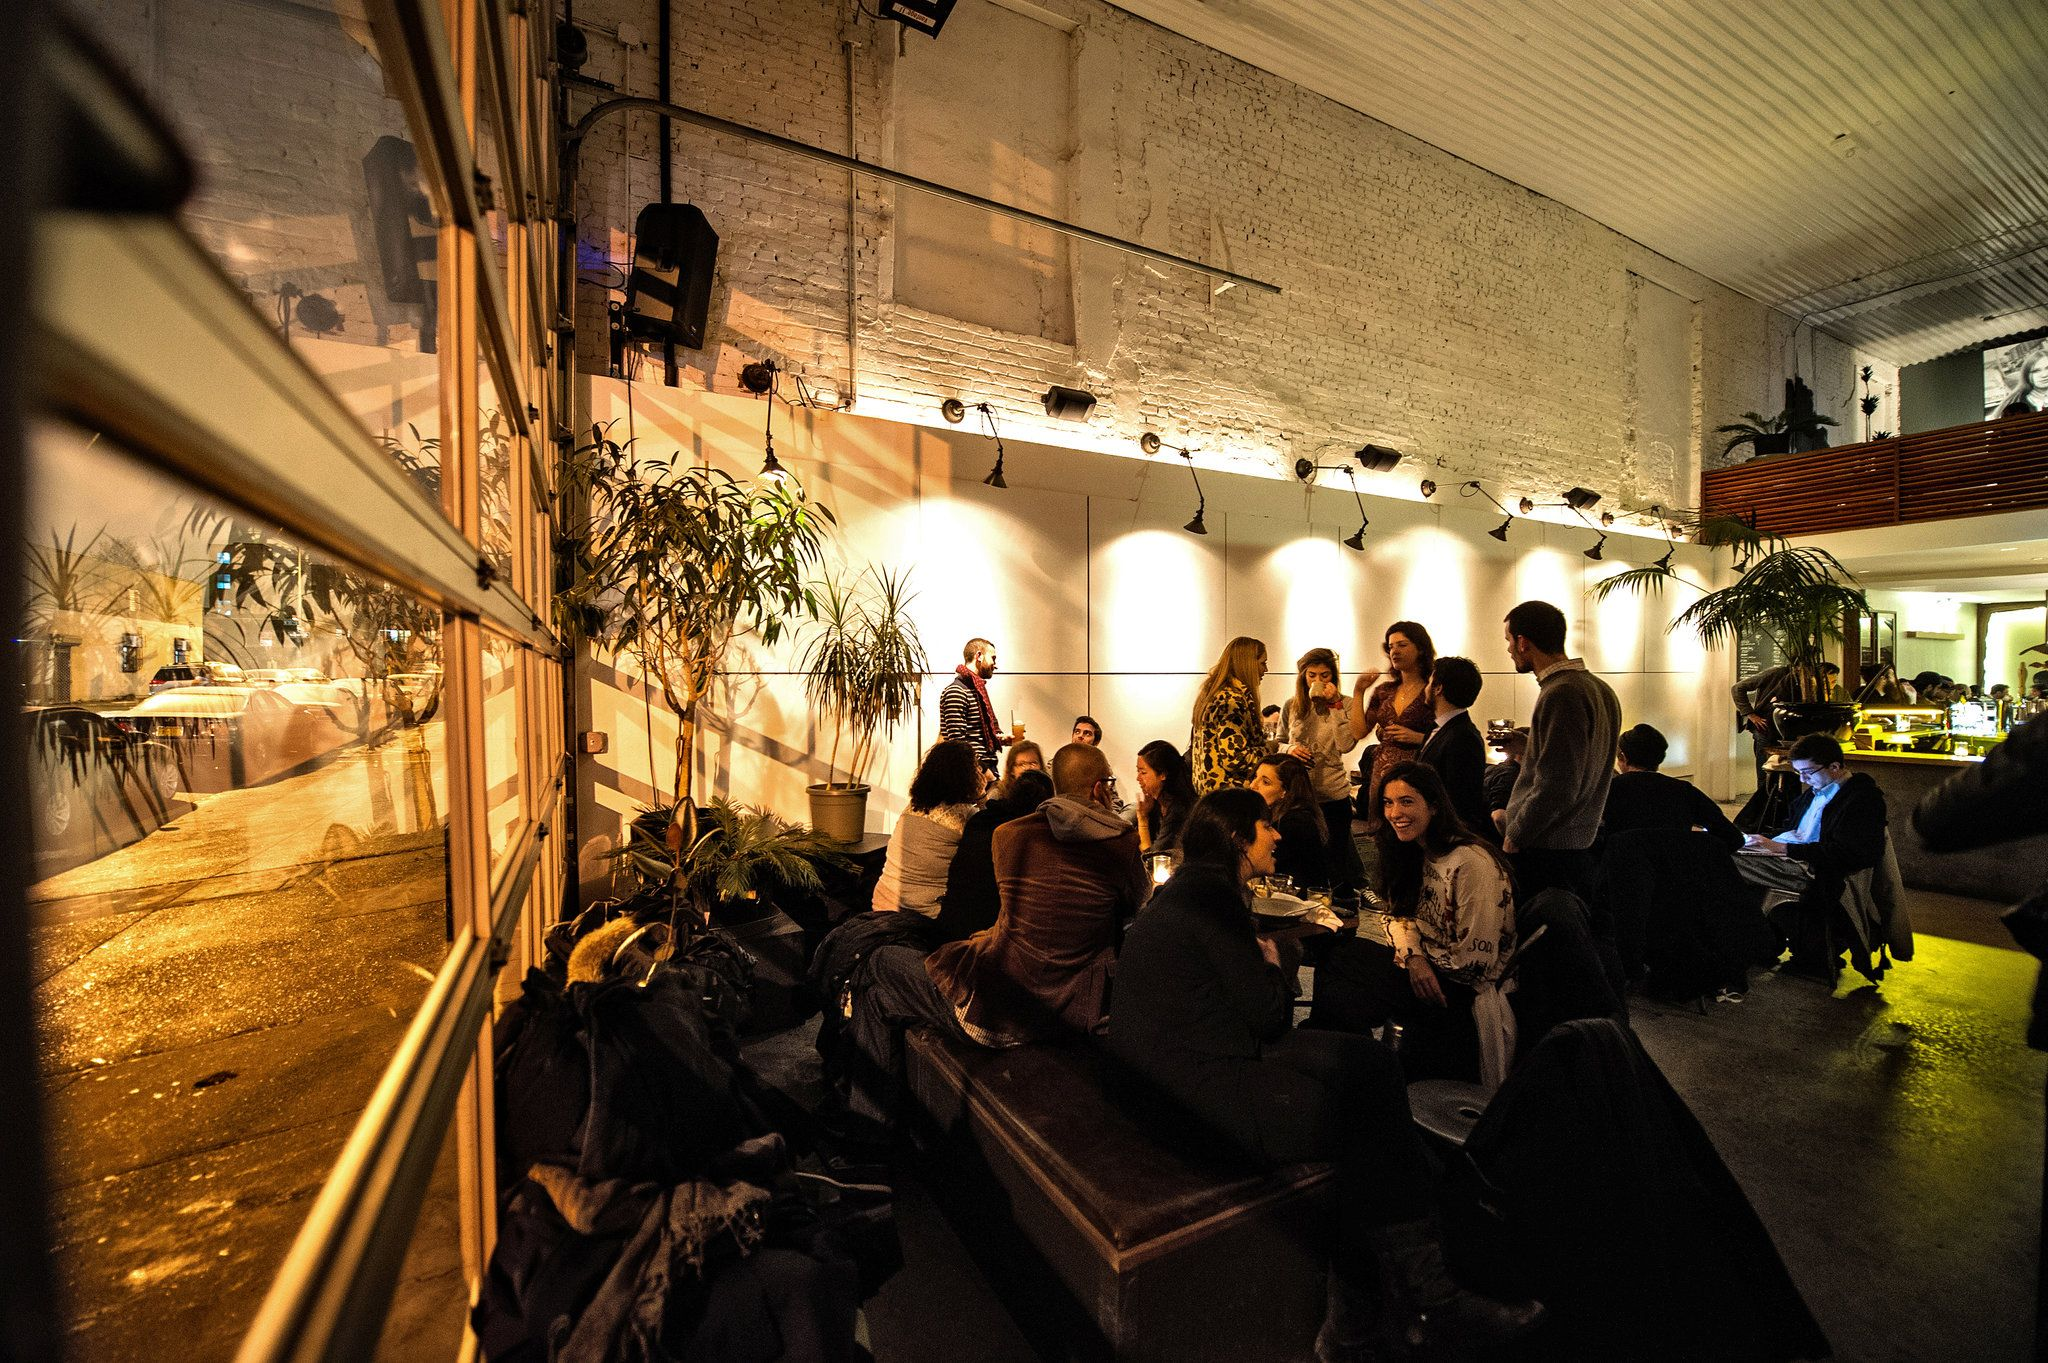 Aska in Williamsburg, Brooklyn | Food | Pinterest | Restaurants and ...